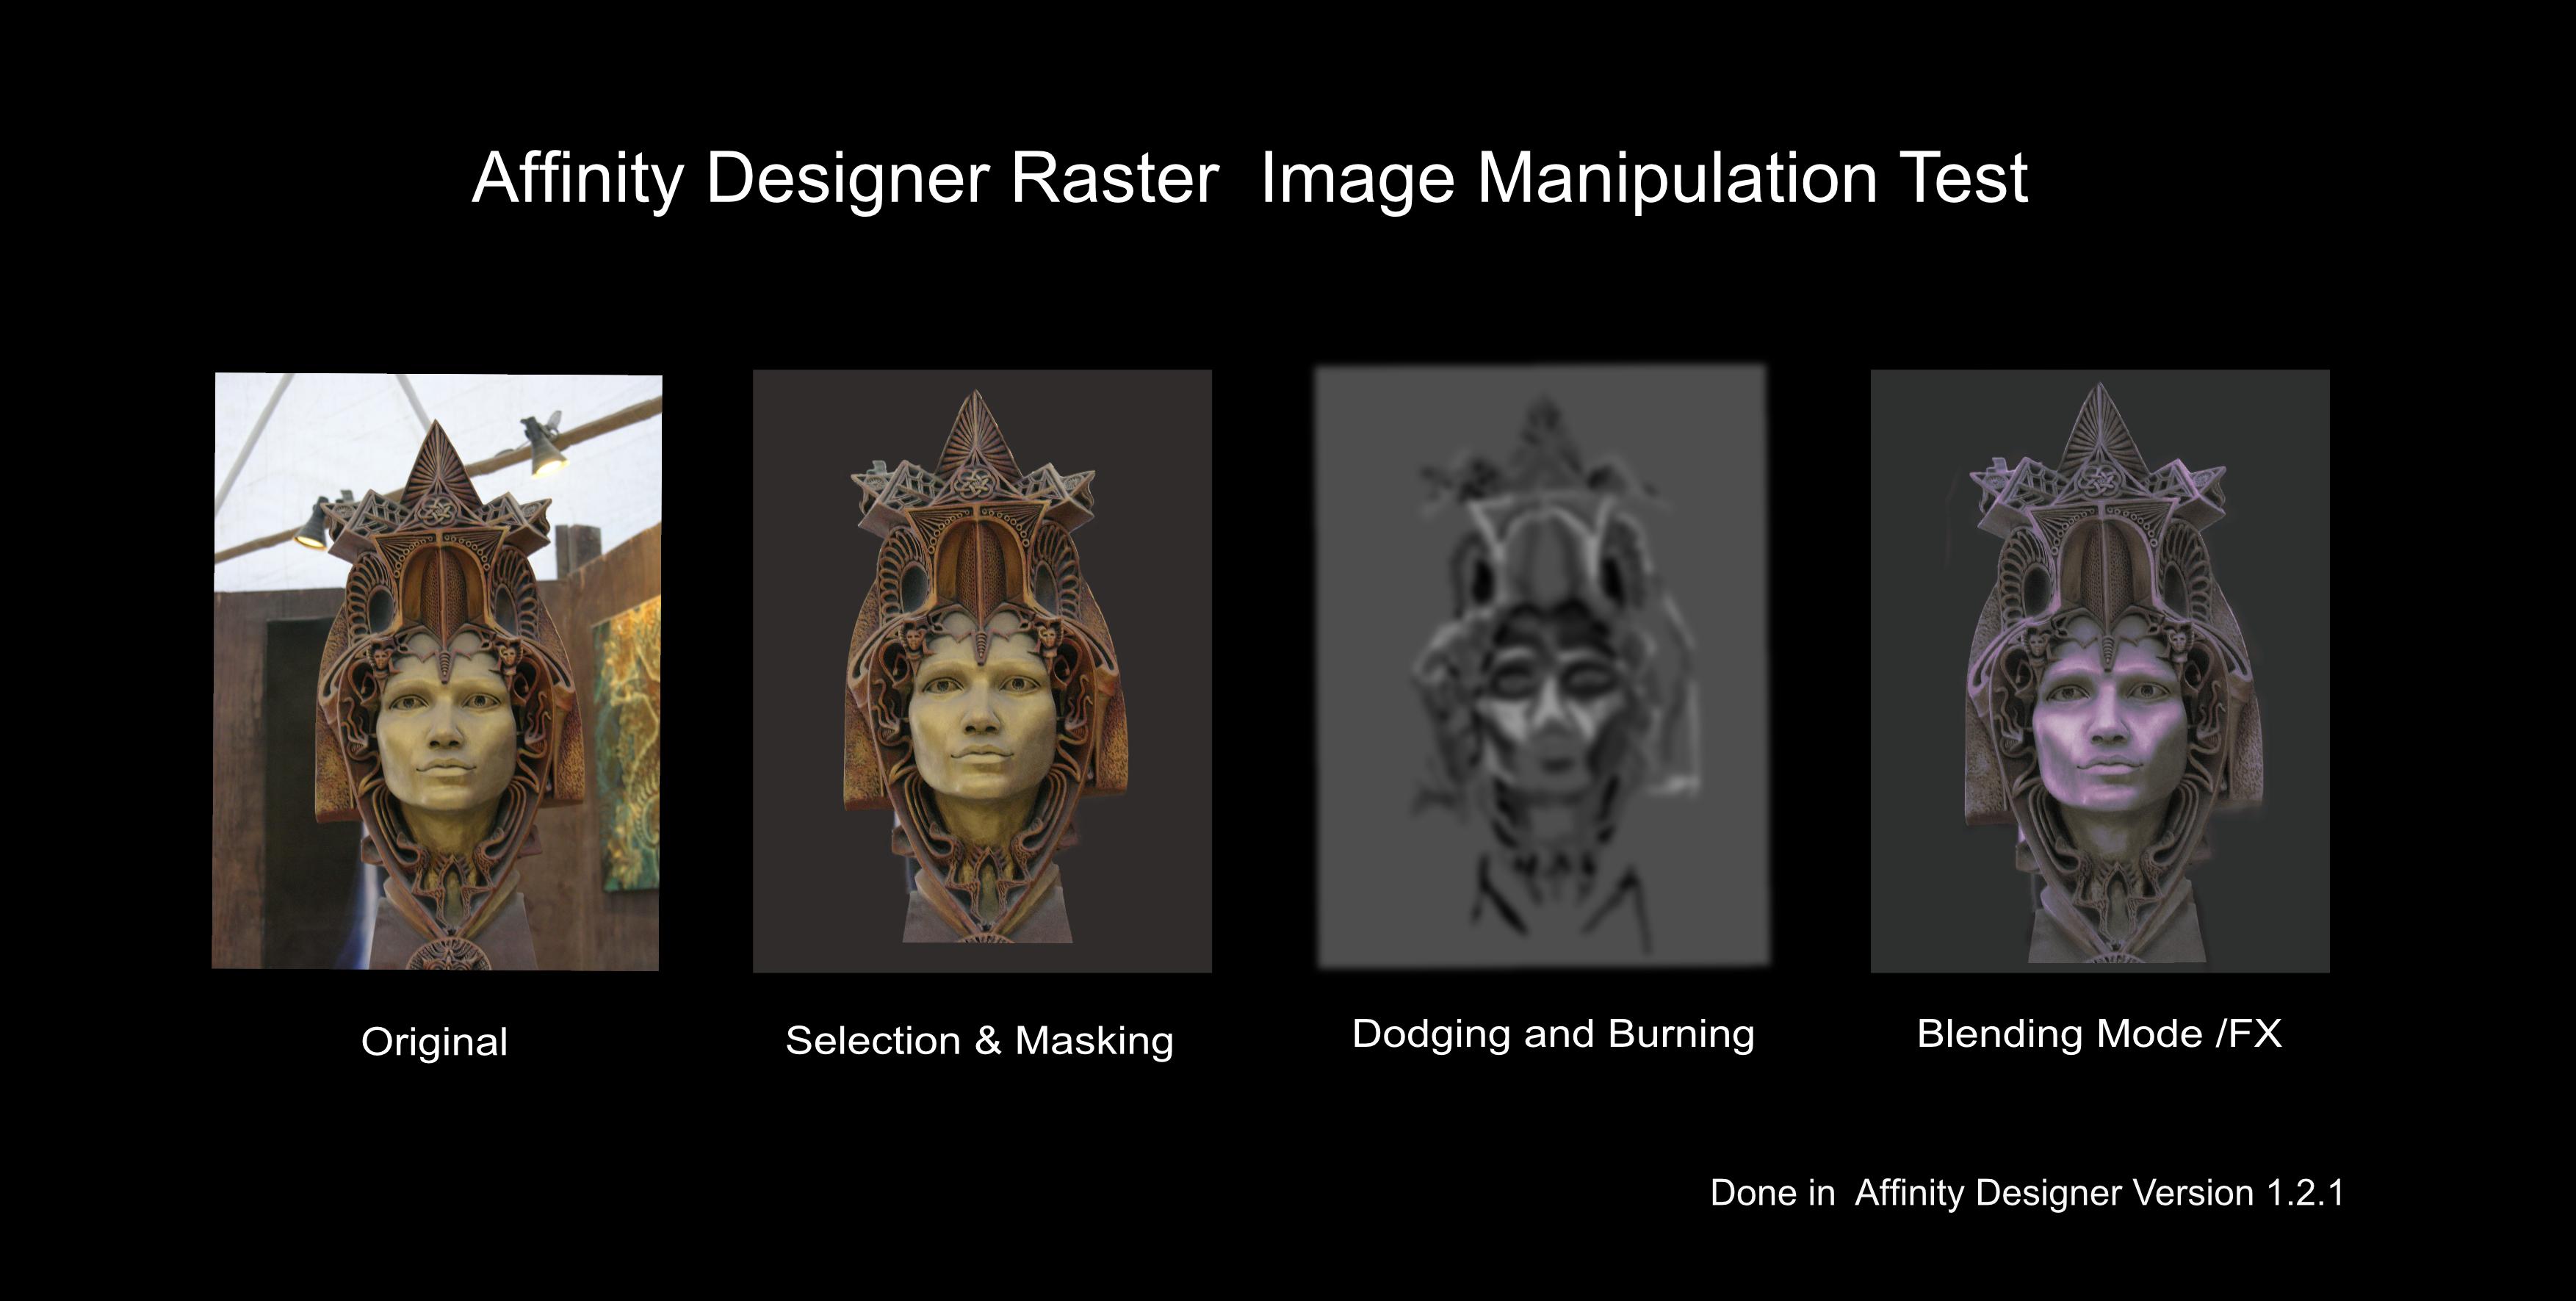 AD_raster_manipulation-test.jpg